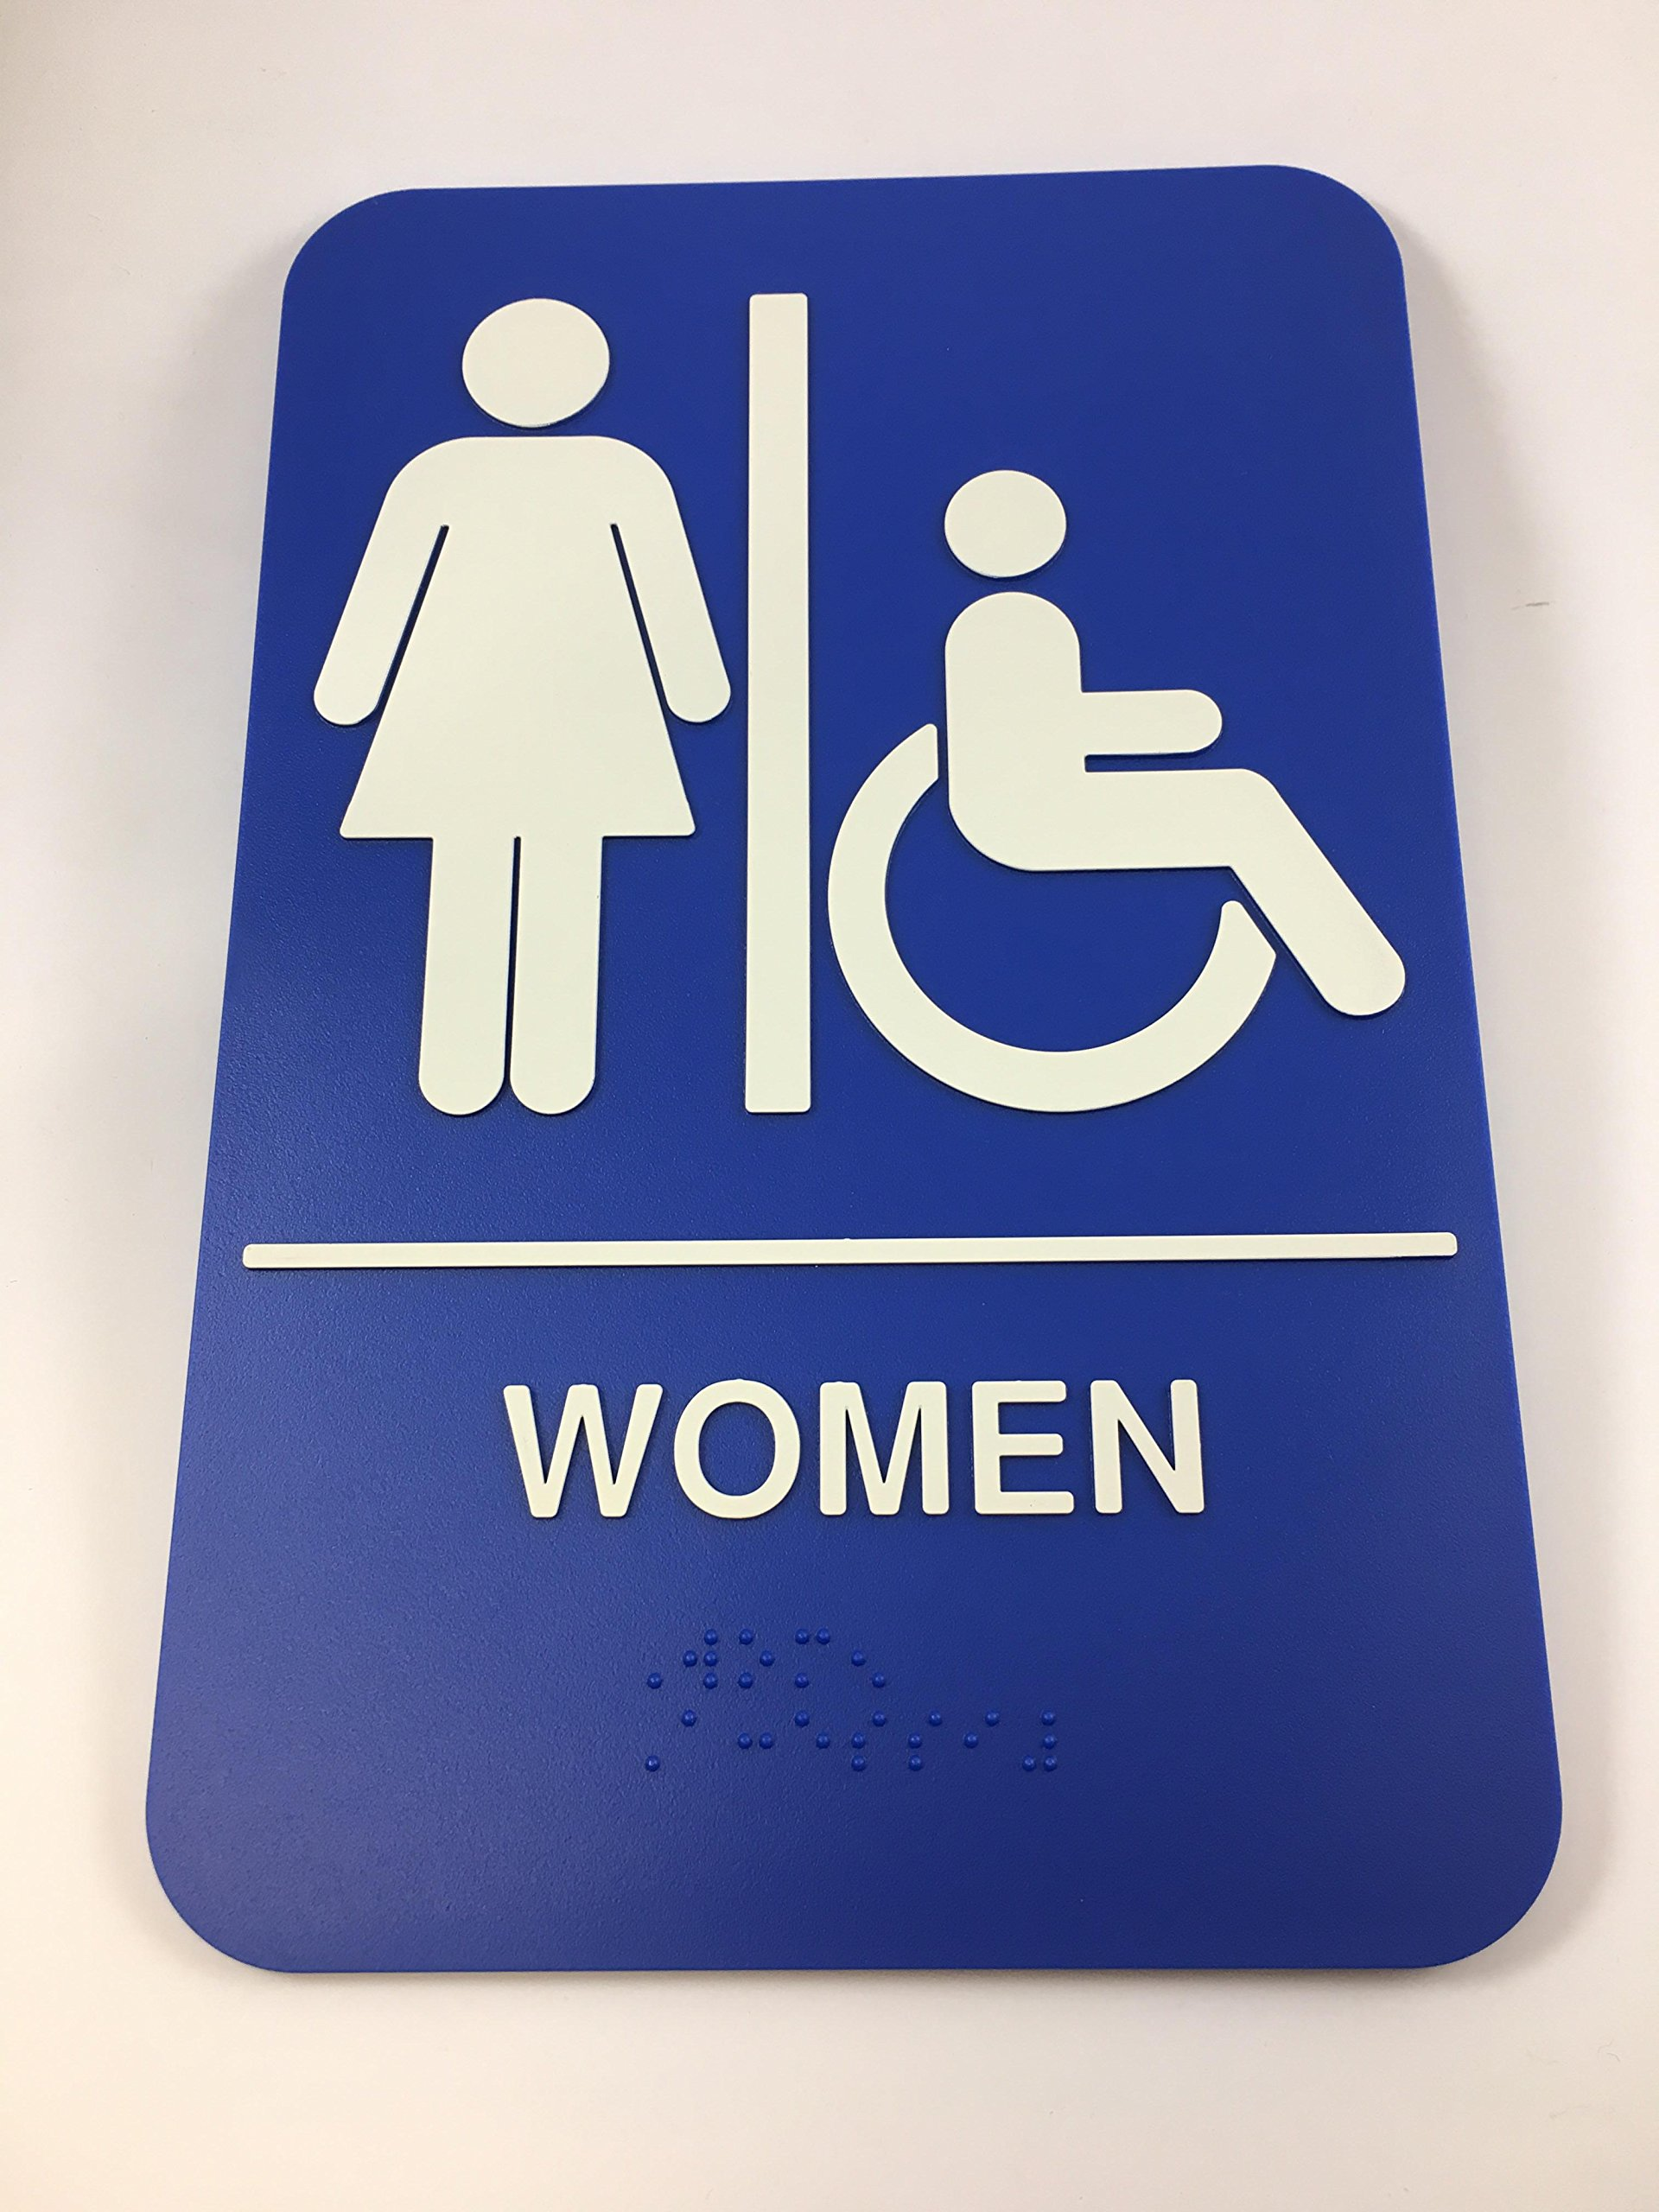 Toiletries Sign Wedding Bathroom Basket Sign Wedding Bathroom Sign UNFRAMED Your Choice of Size and Color Print Sign Bathroom Goodies sign Wedding Reception Signage Set of 2